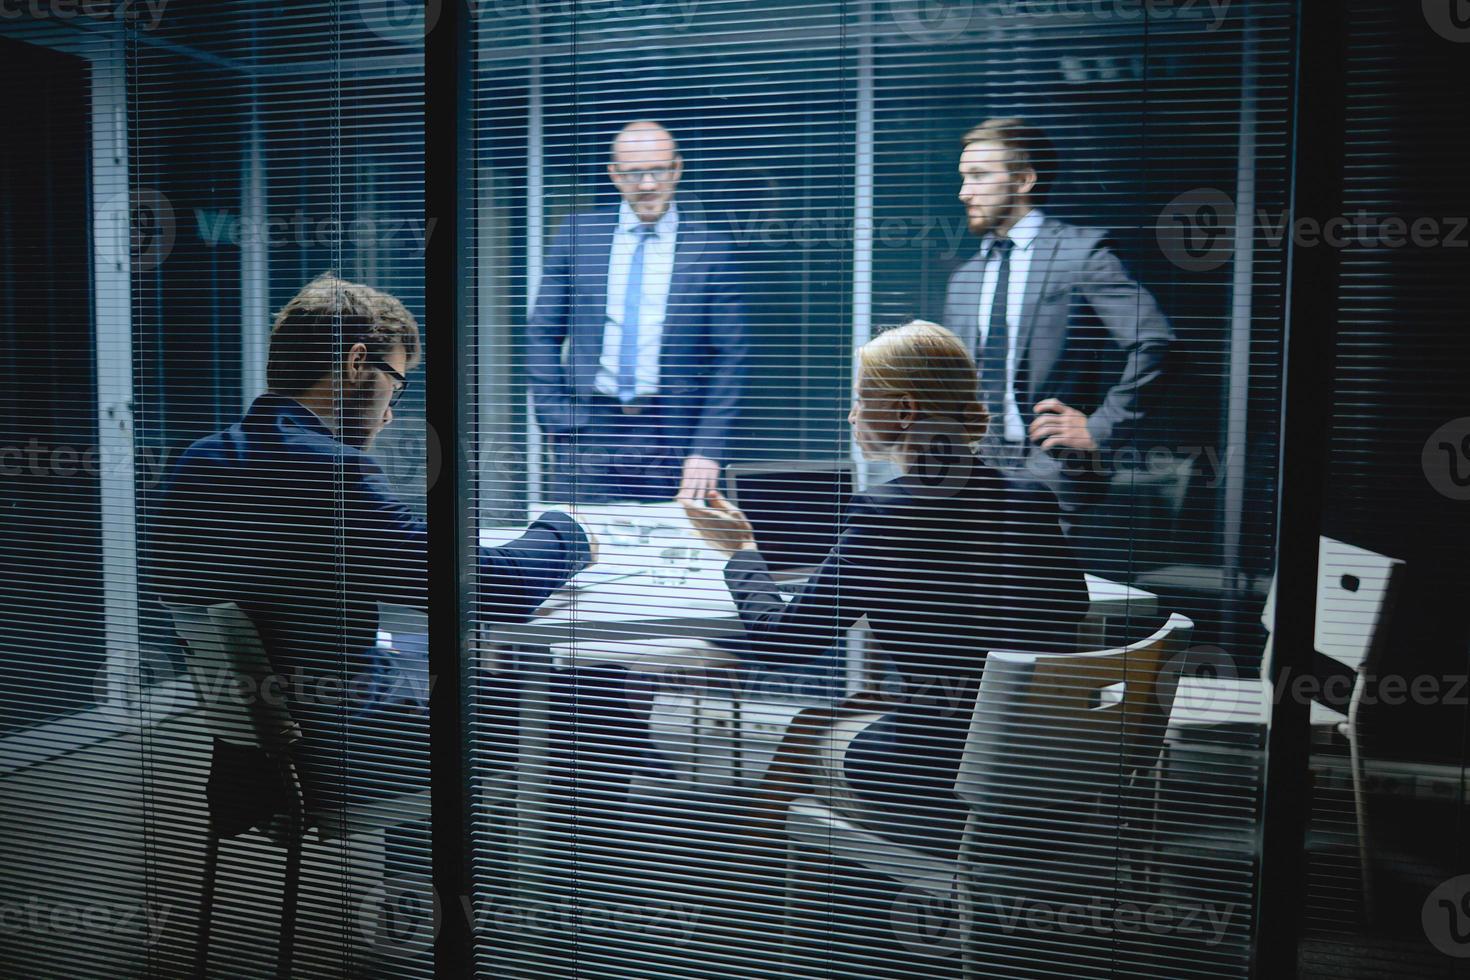 riunione dei dirigenti foto